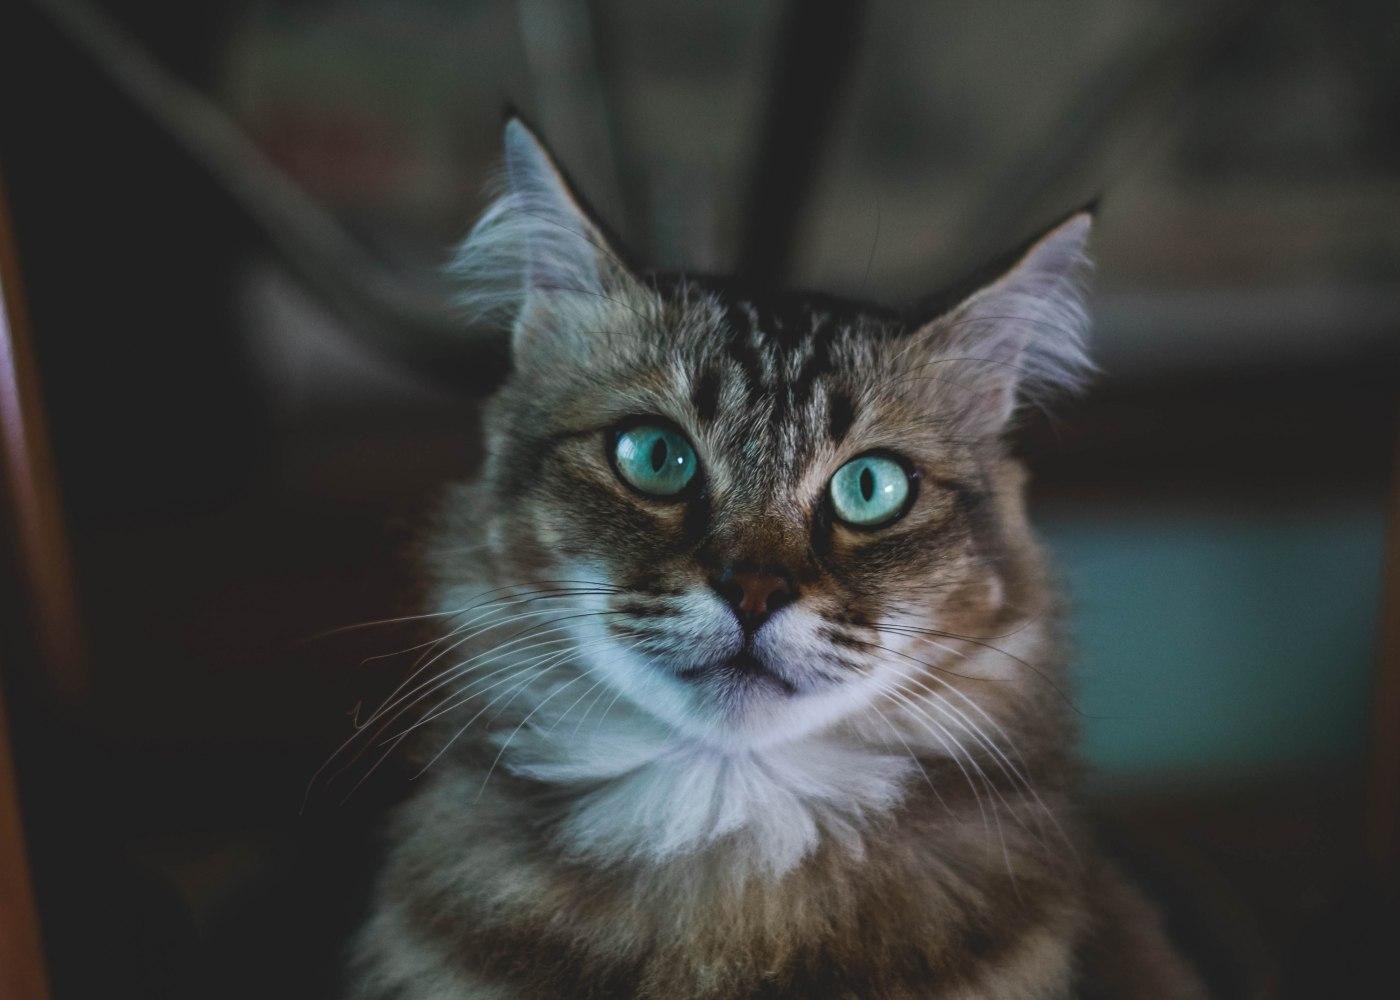 Gato de olhos verdes